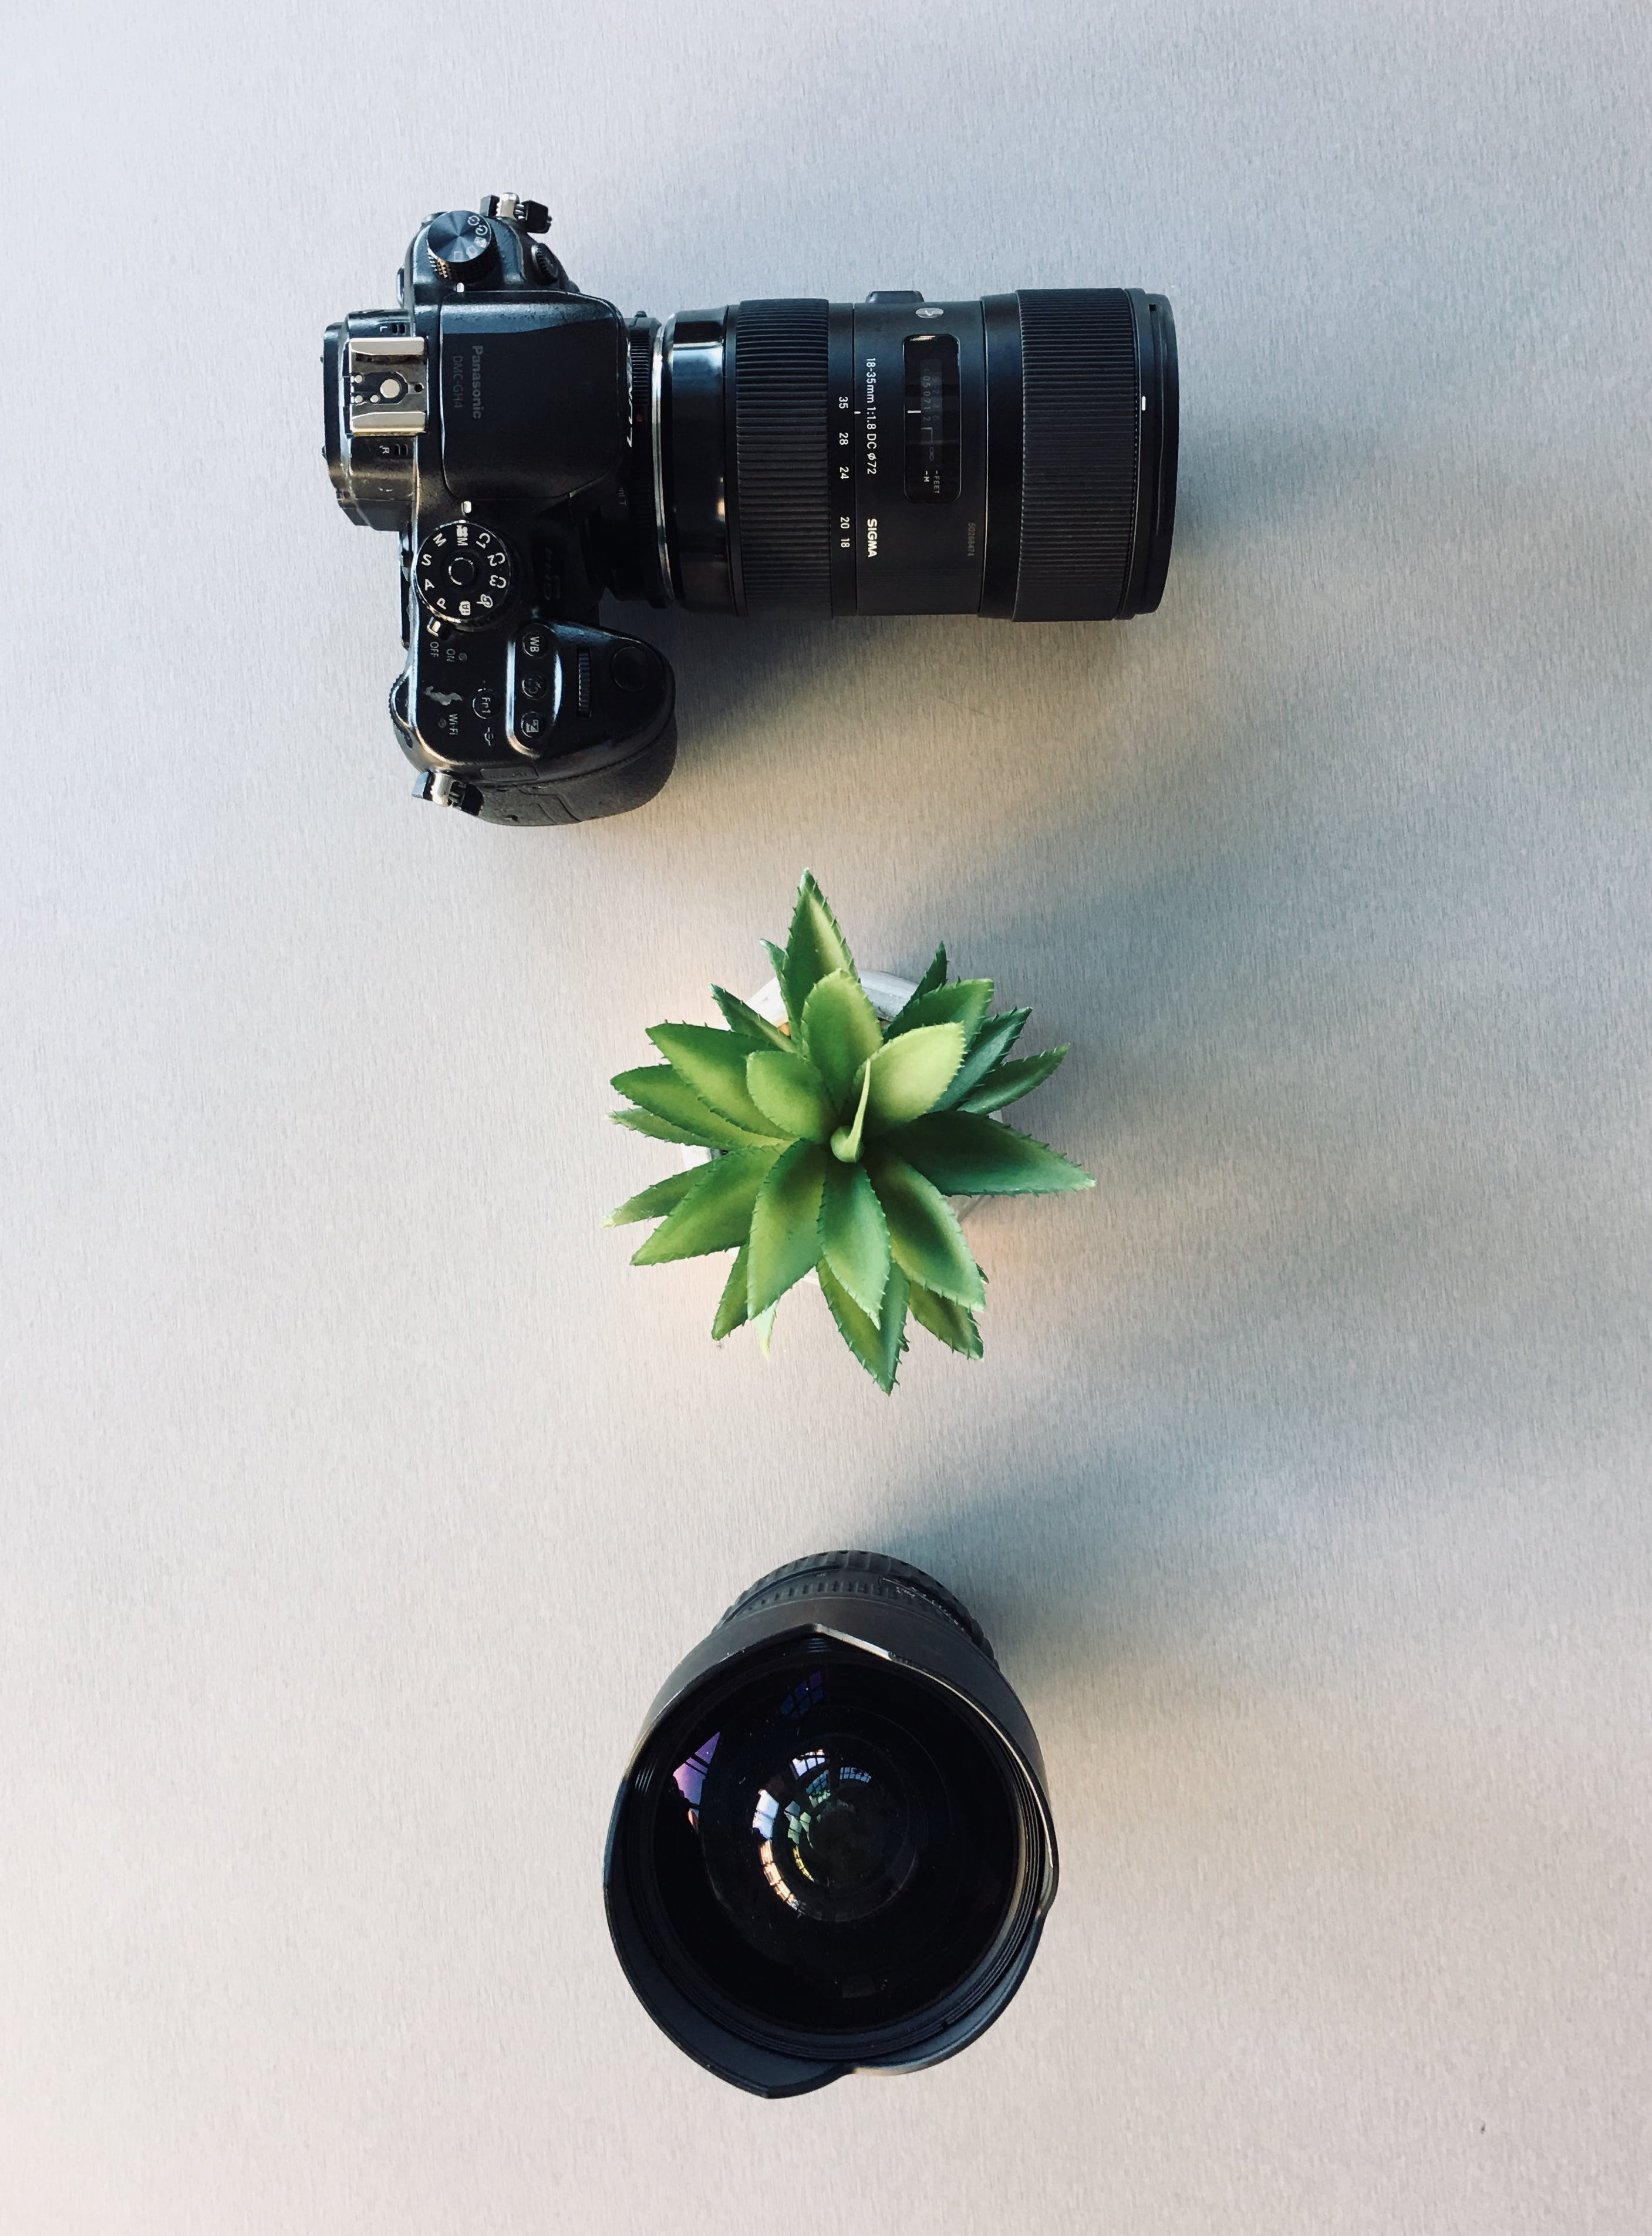 Camera and Succulent Plant